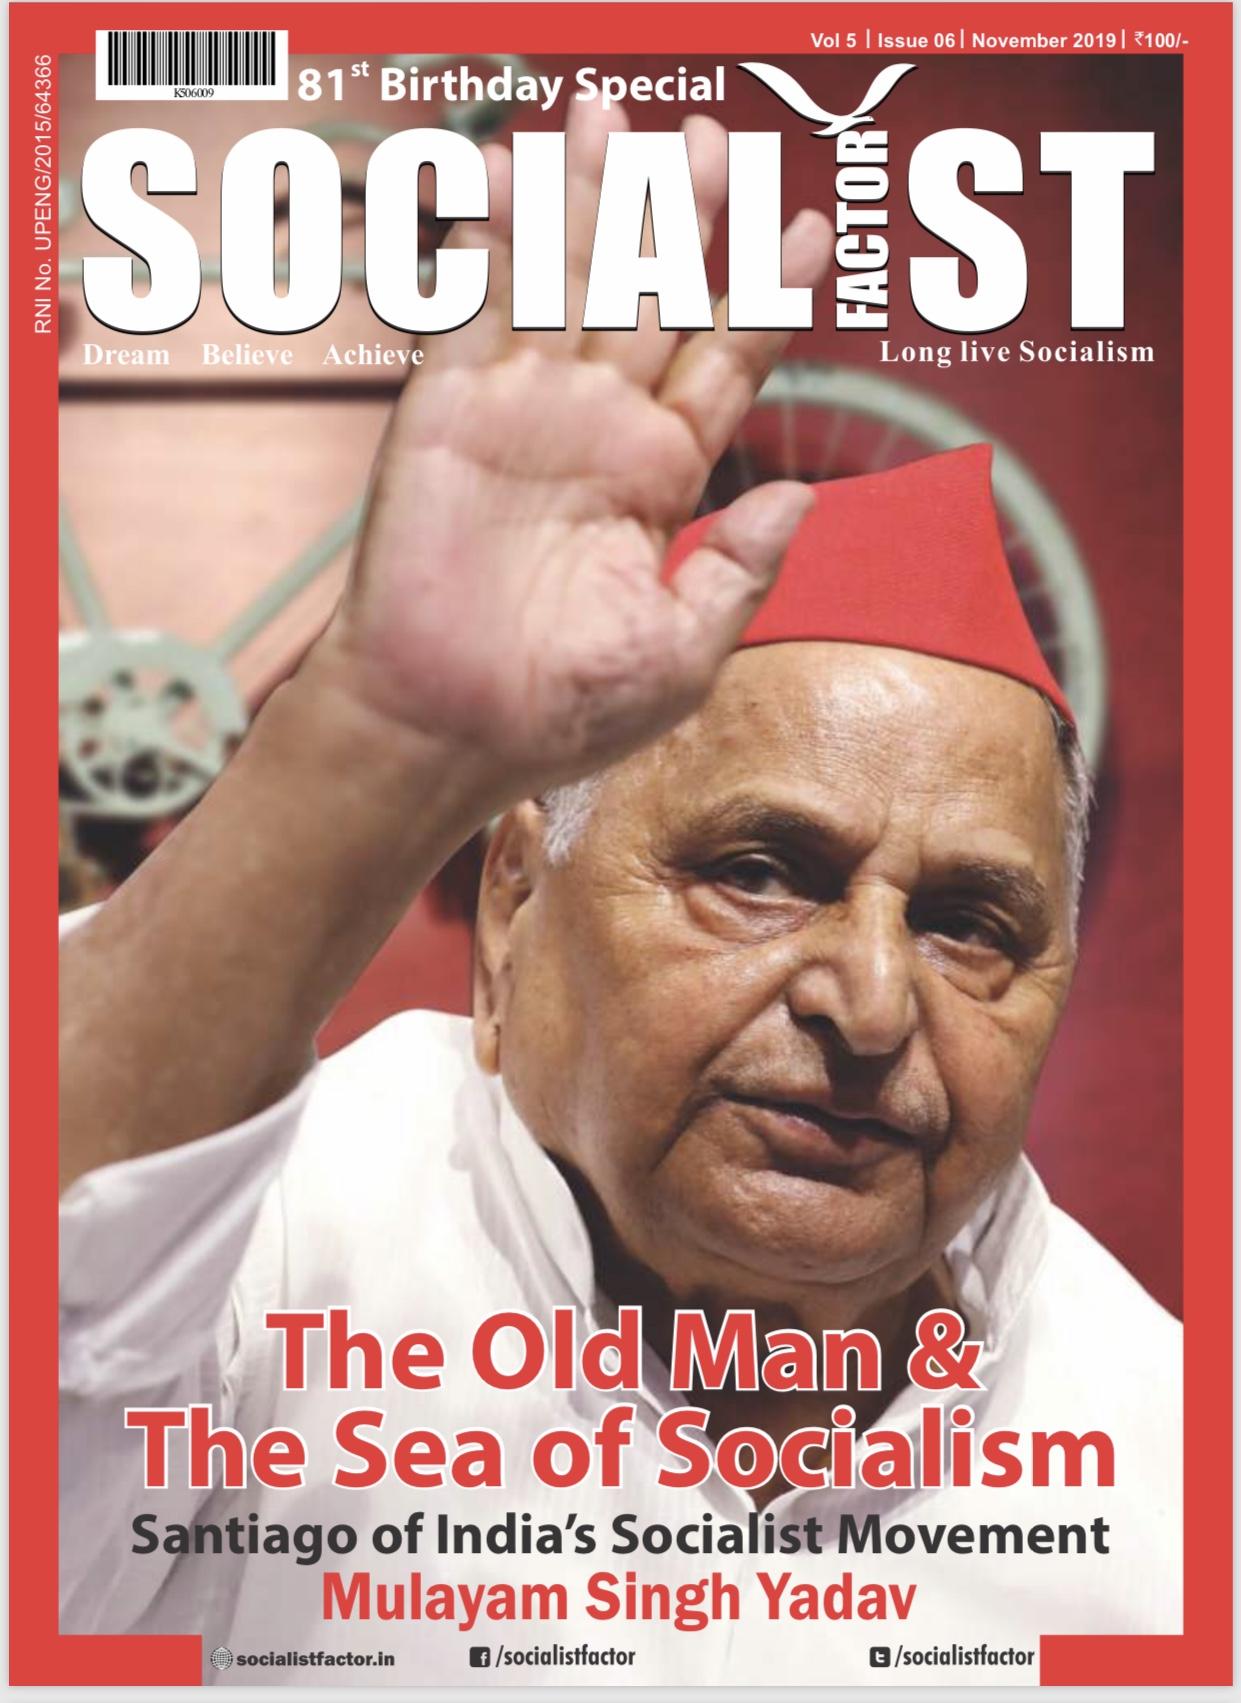 2019_11_irene_caesar_manifesto_of_matrix_city_ra_socialist_factor_cover